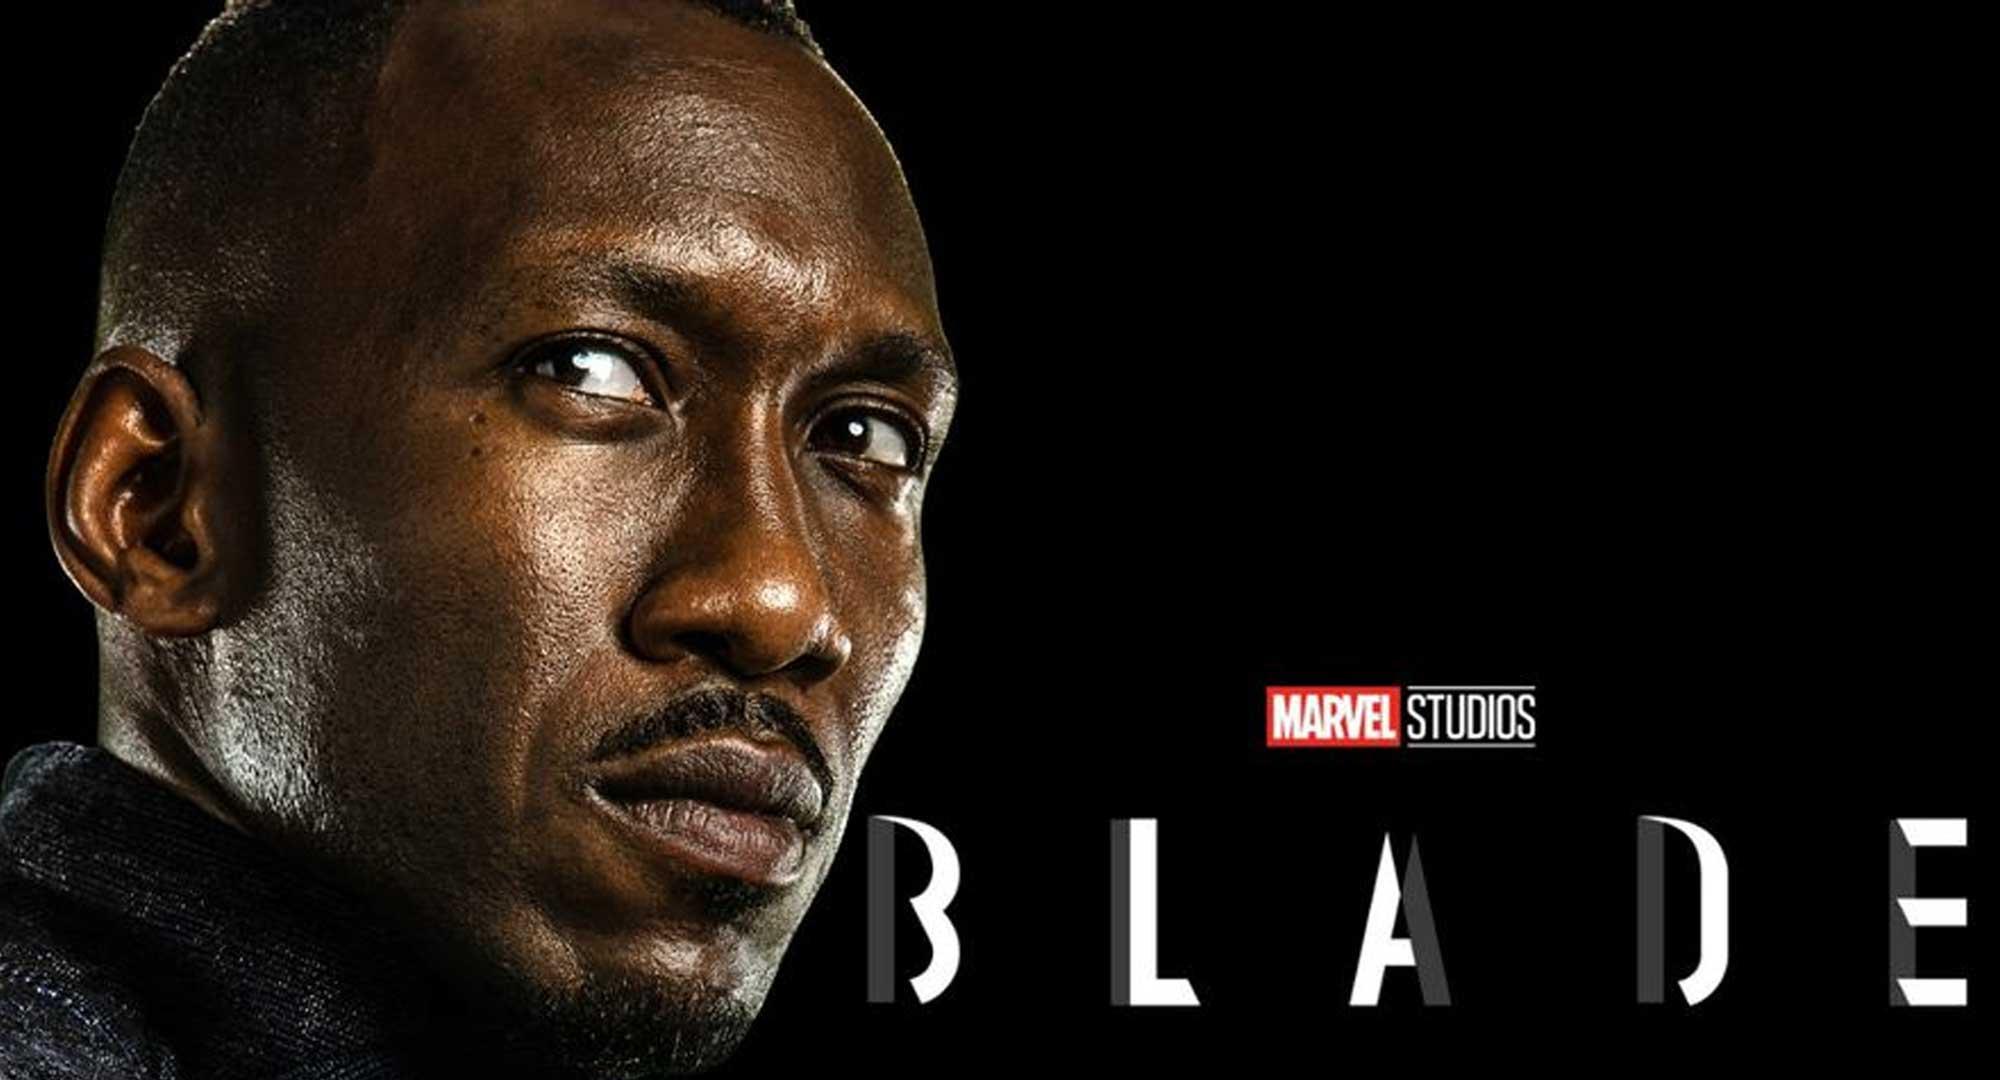 Blade: Il film Marvel avrà la scrittrice di Watchmen, Stacy Osei-Kuffour